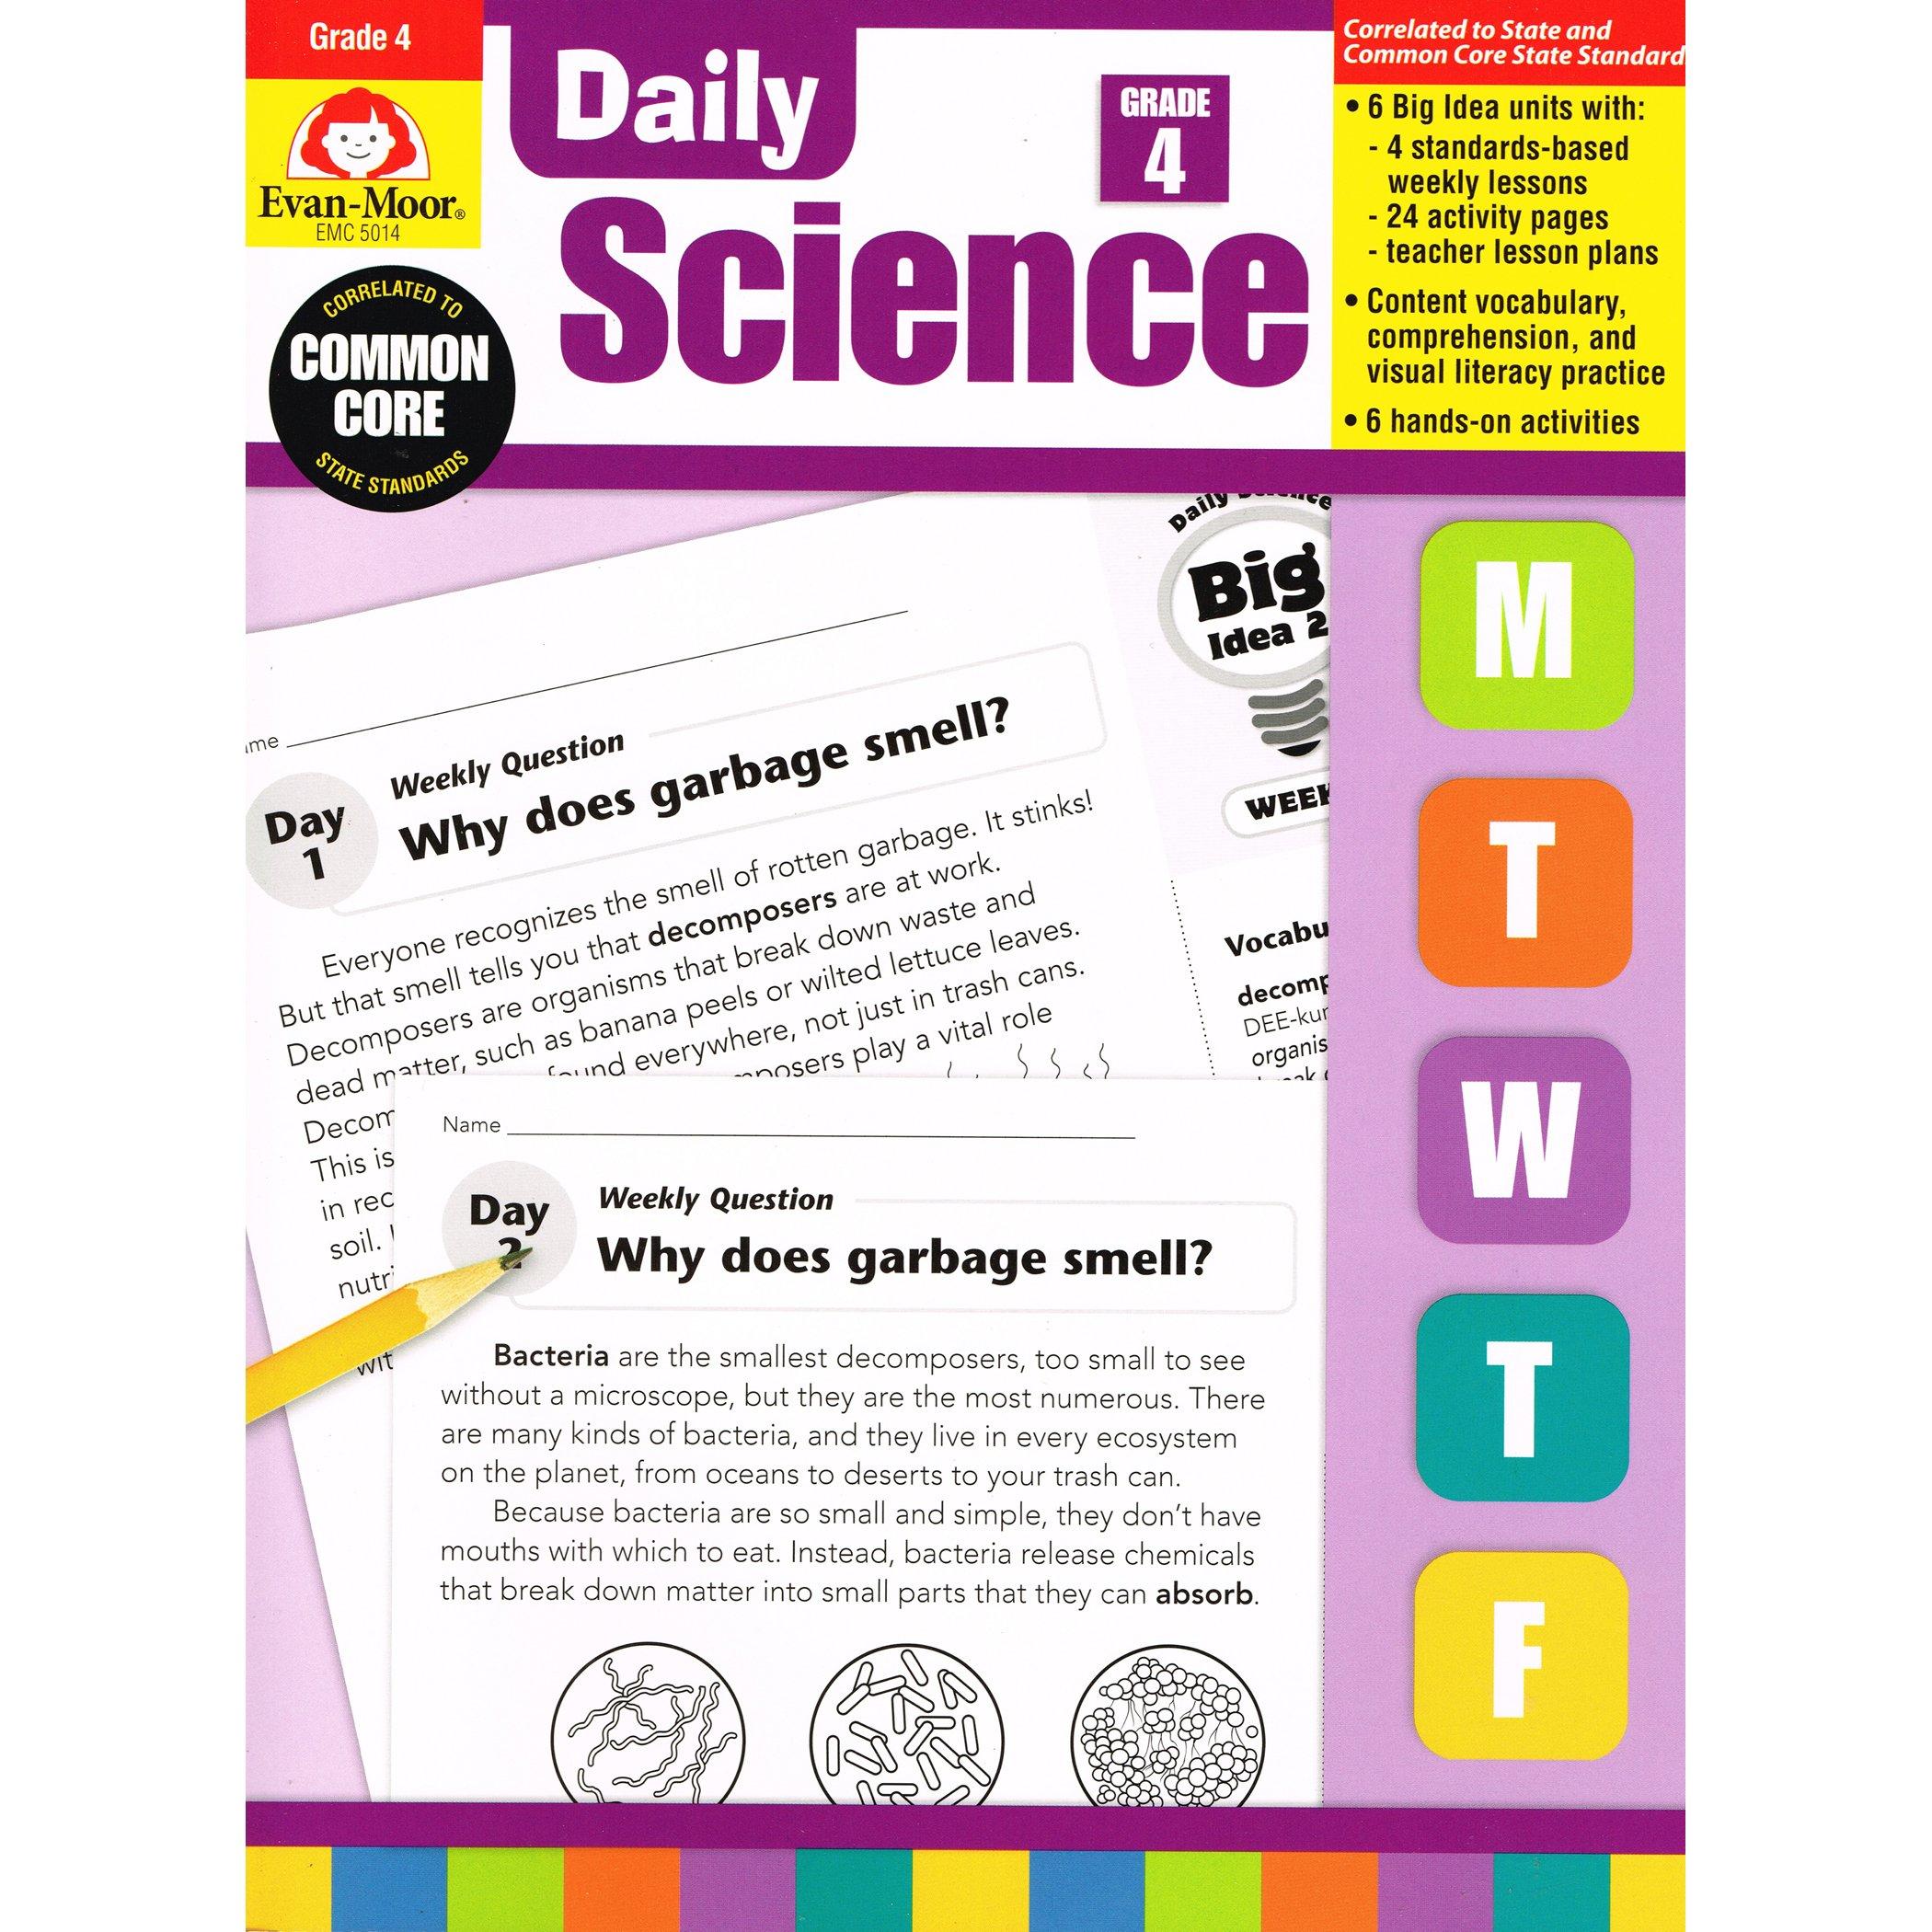 Daily Science, Grade 4: Barbara Price, Marilyn Evans, Pamela San